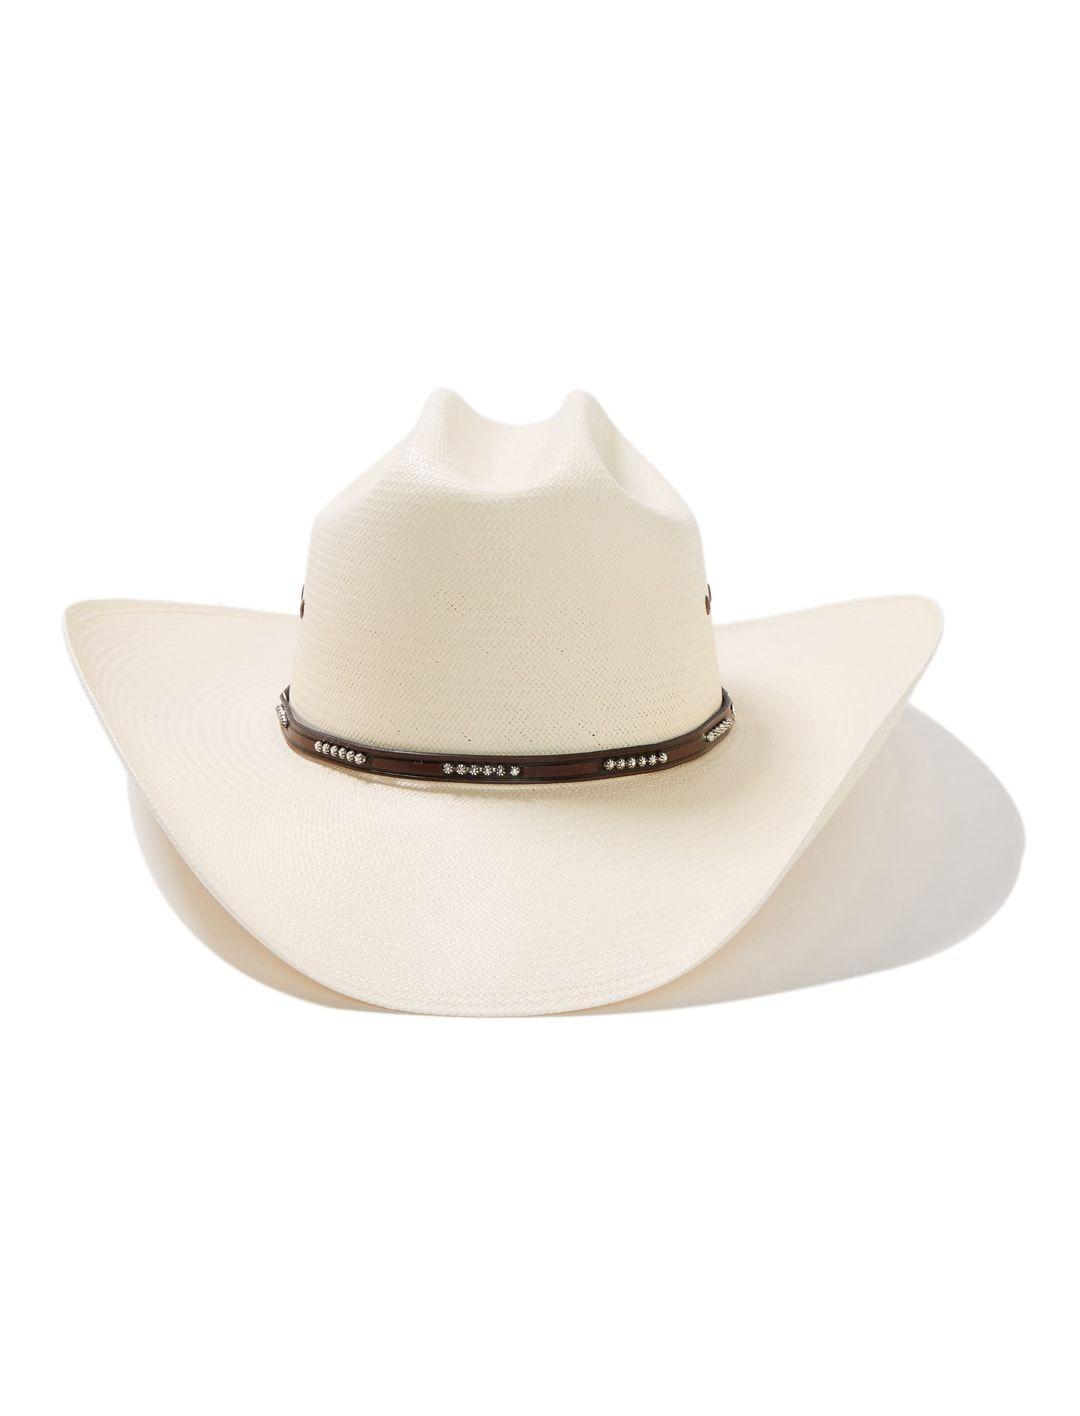 Stetson Men's Llano 10X Straw Cowboy Hat SSLLNO3042